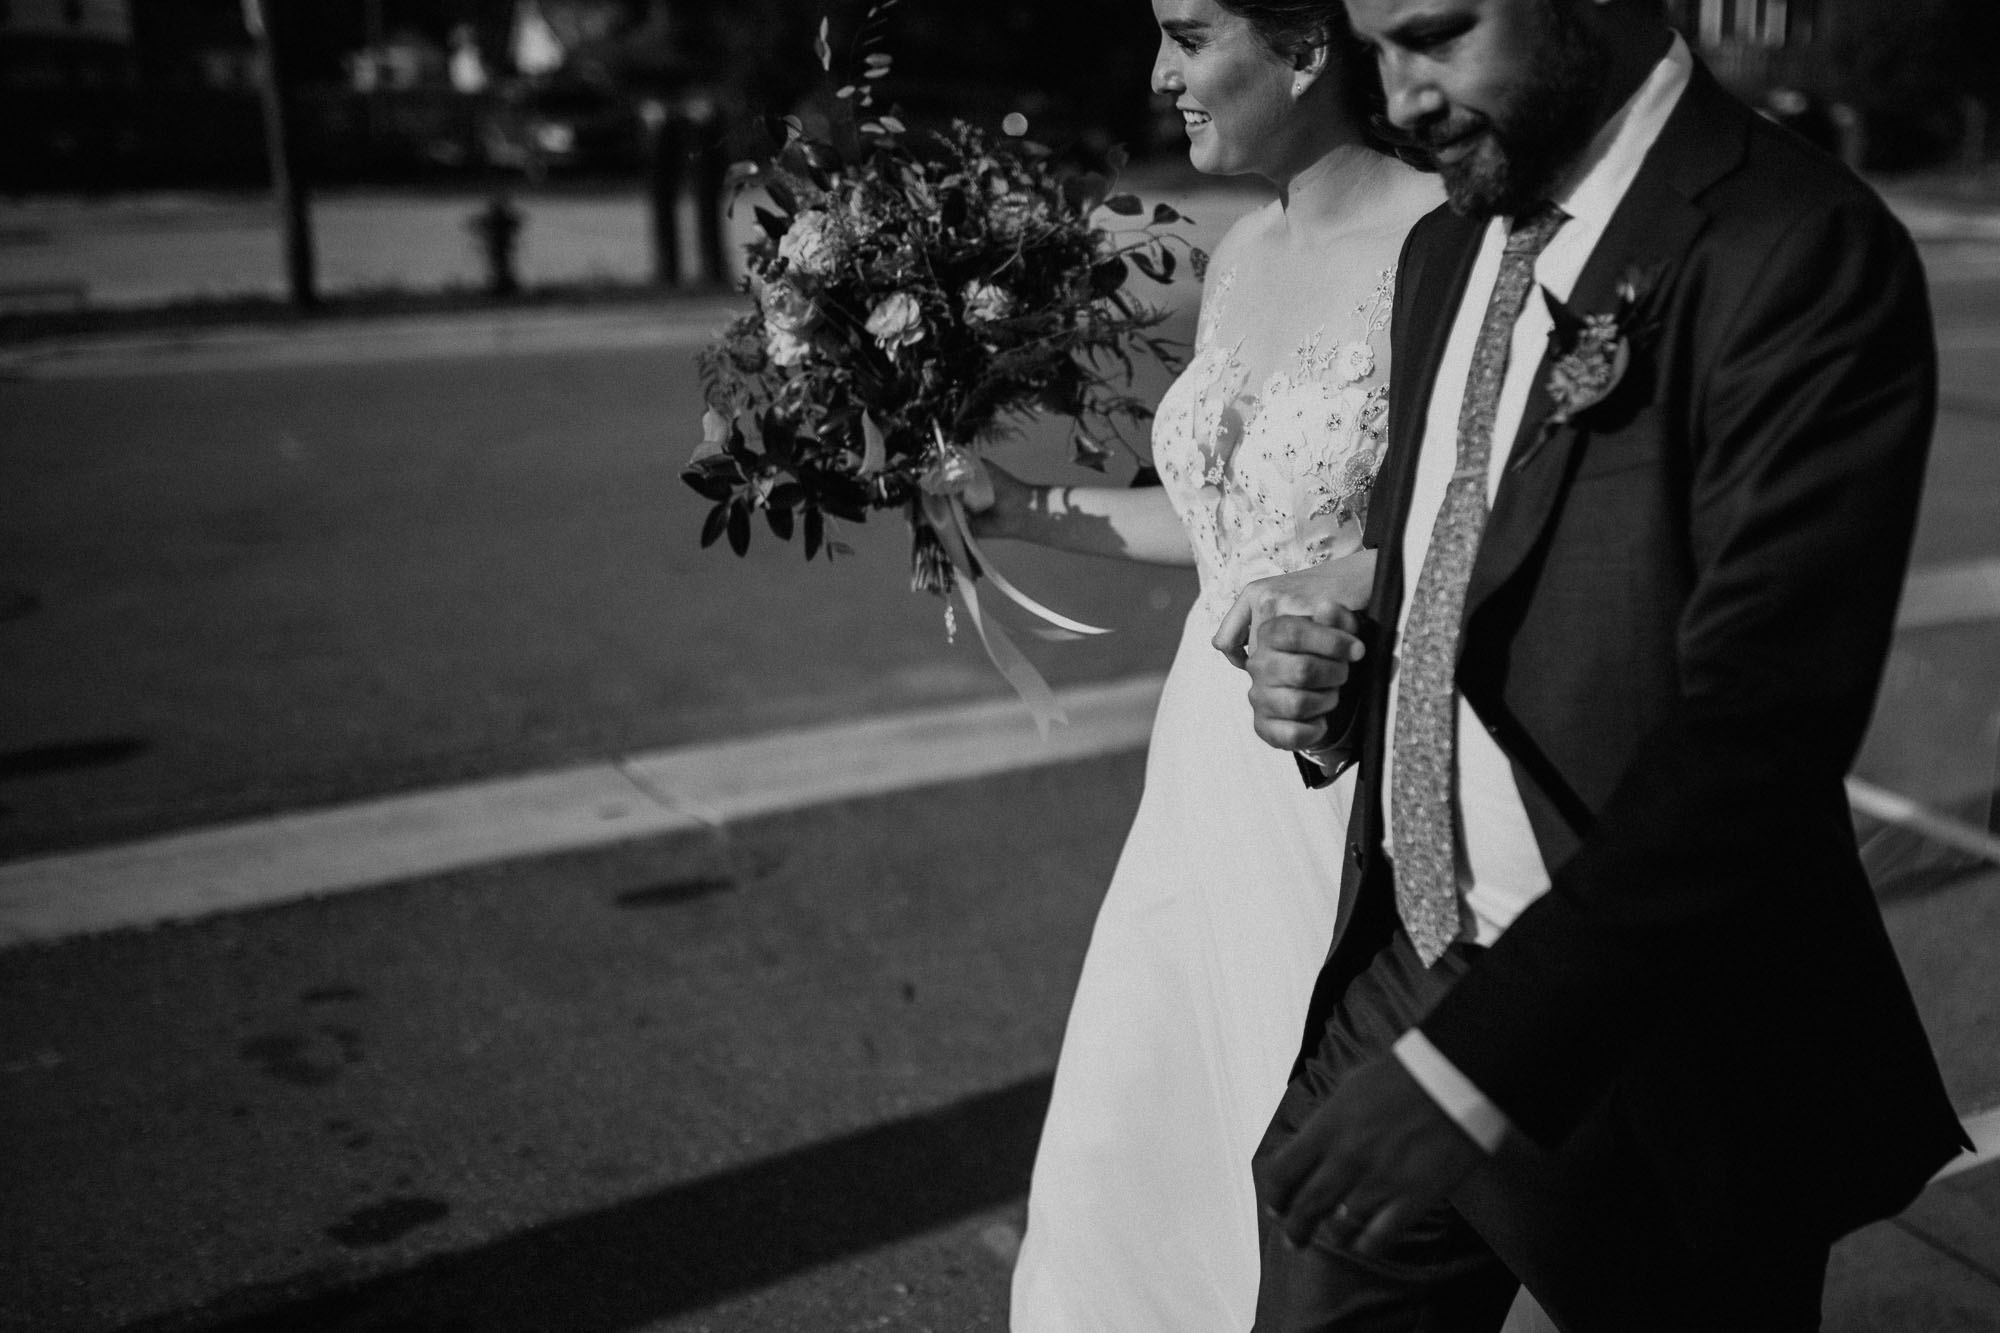 journeyman_distillery_wedding_photographer_chicago_il_wright_photographs-3911.jpg